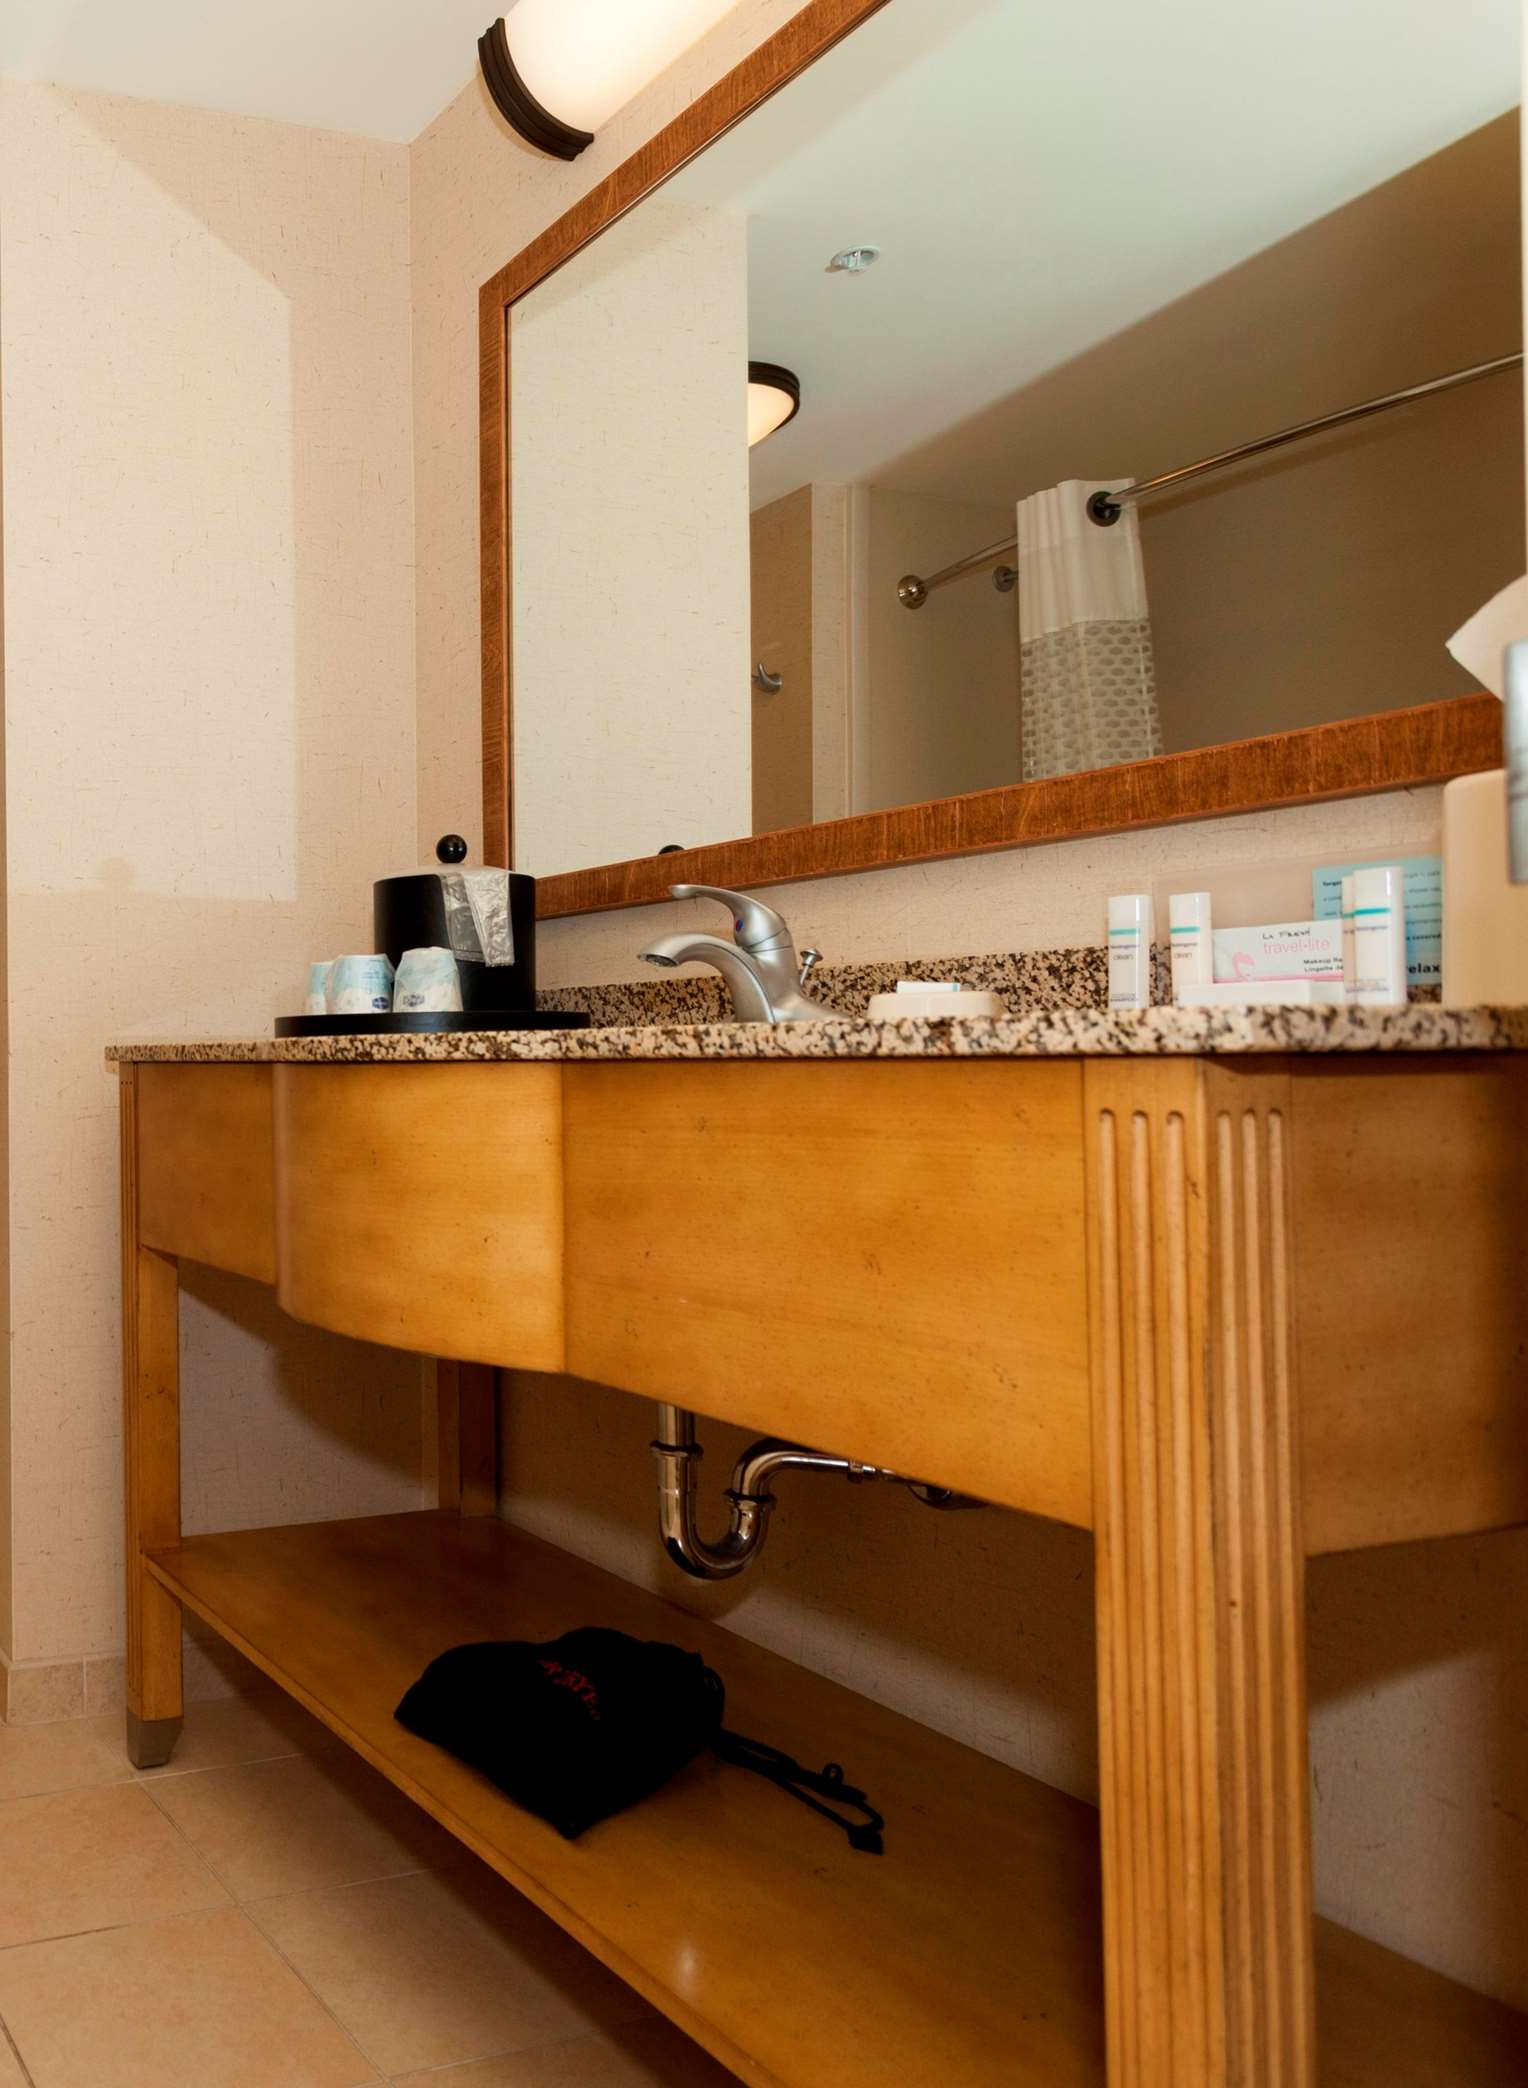 Hampton Inn & Suites Riverton image 41